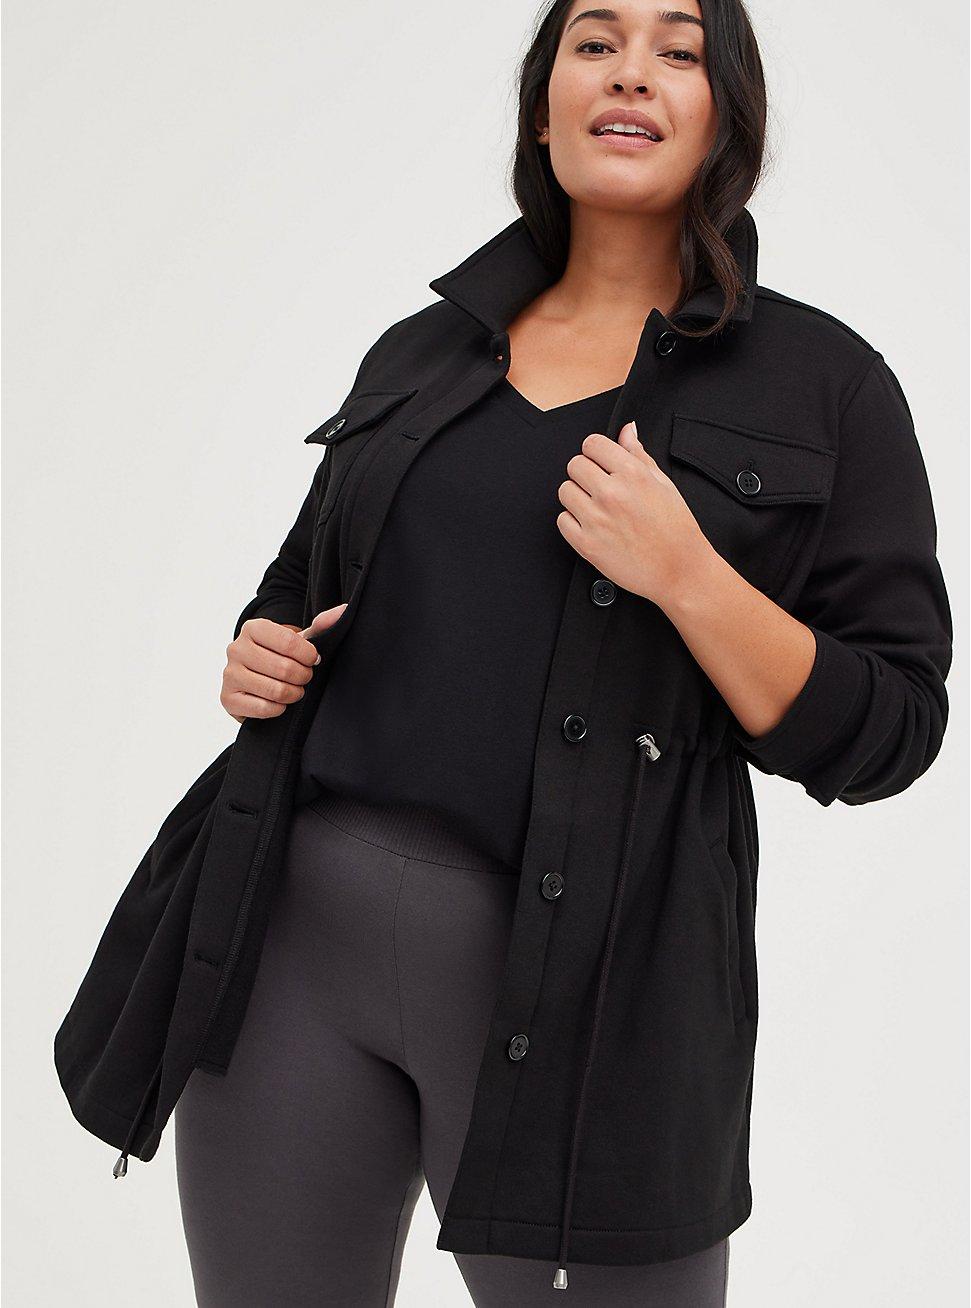 Shacket - Fleece Black, DEEP BLACK, hi-res